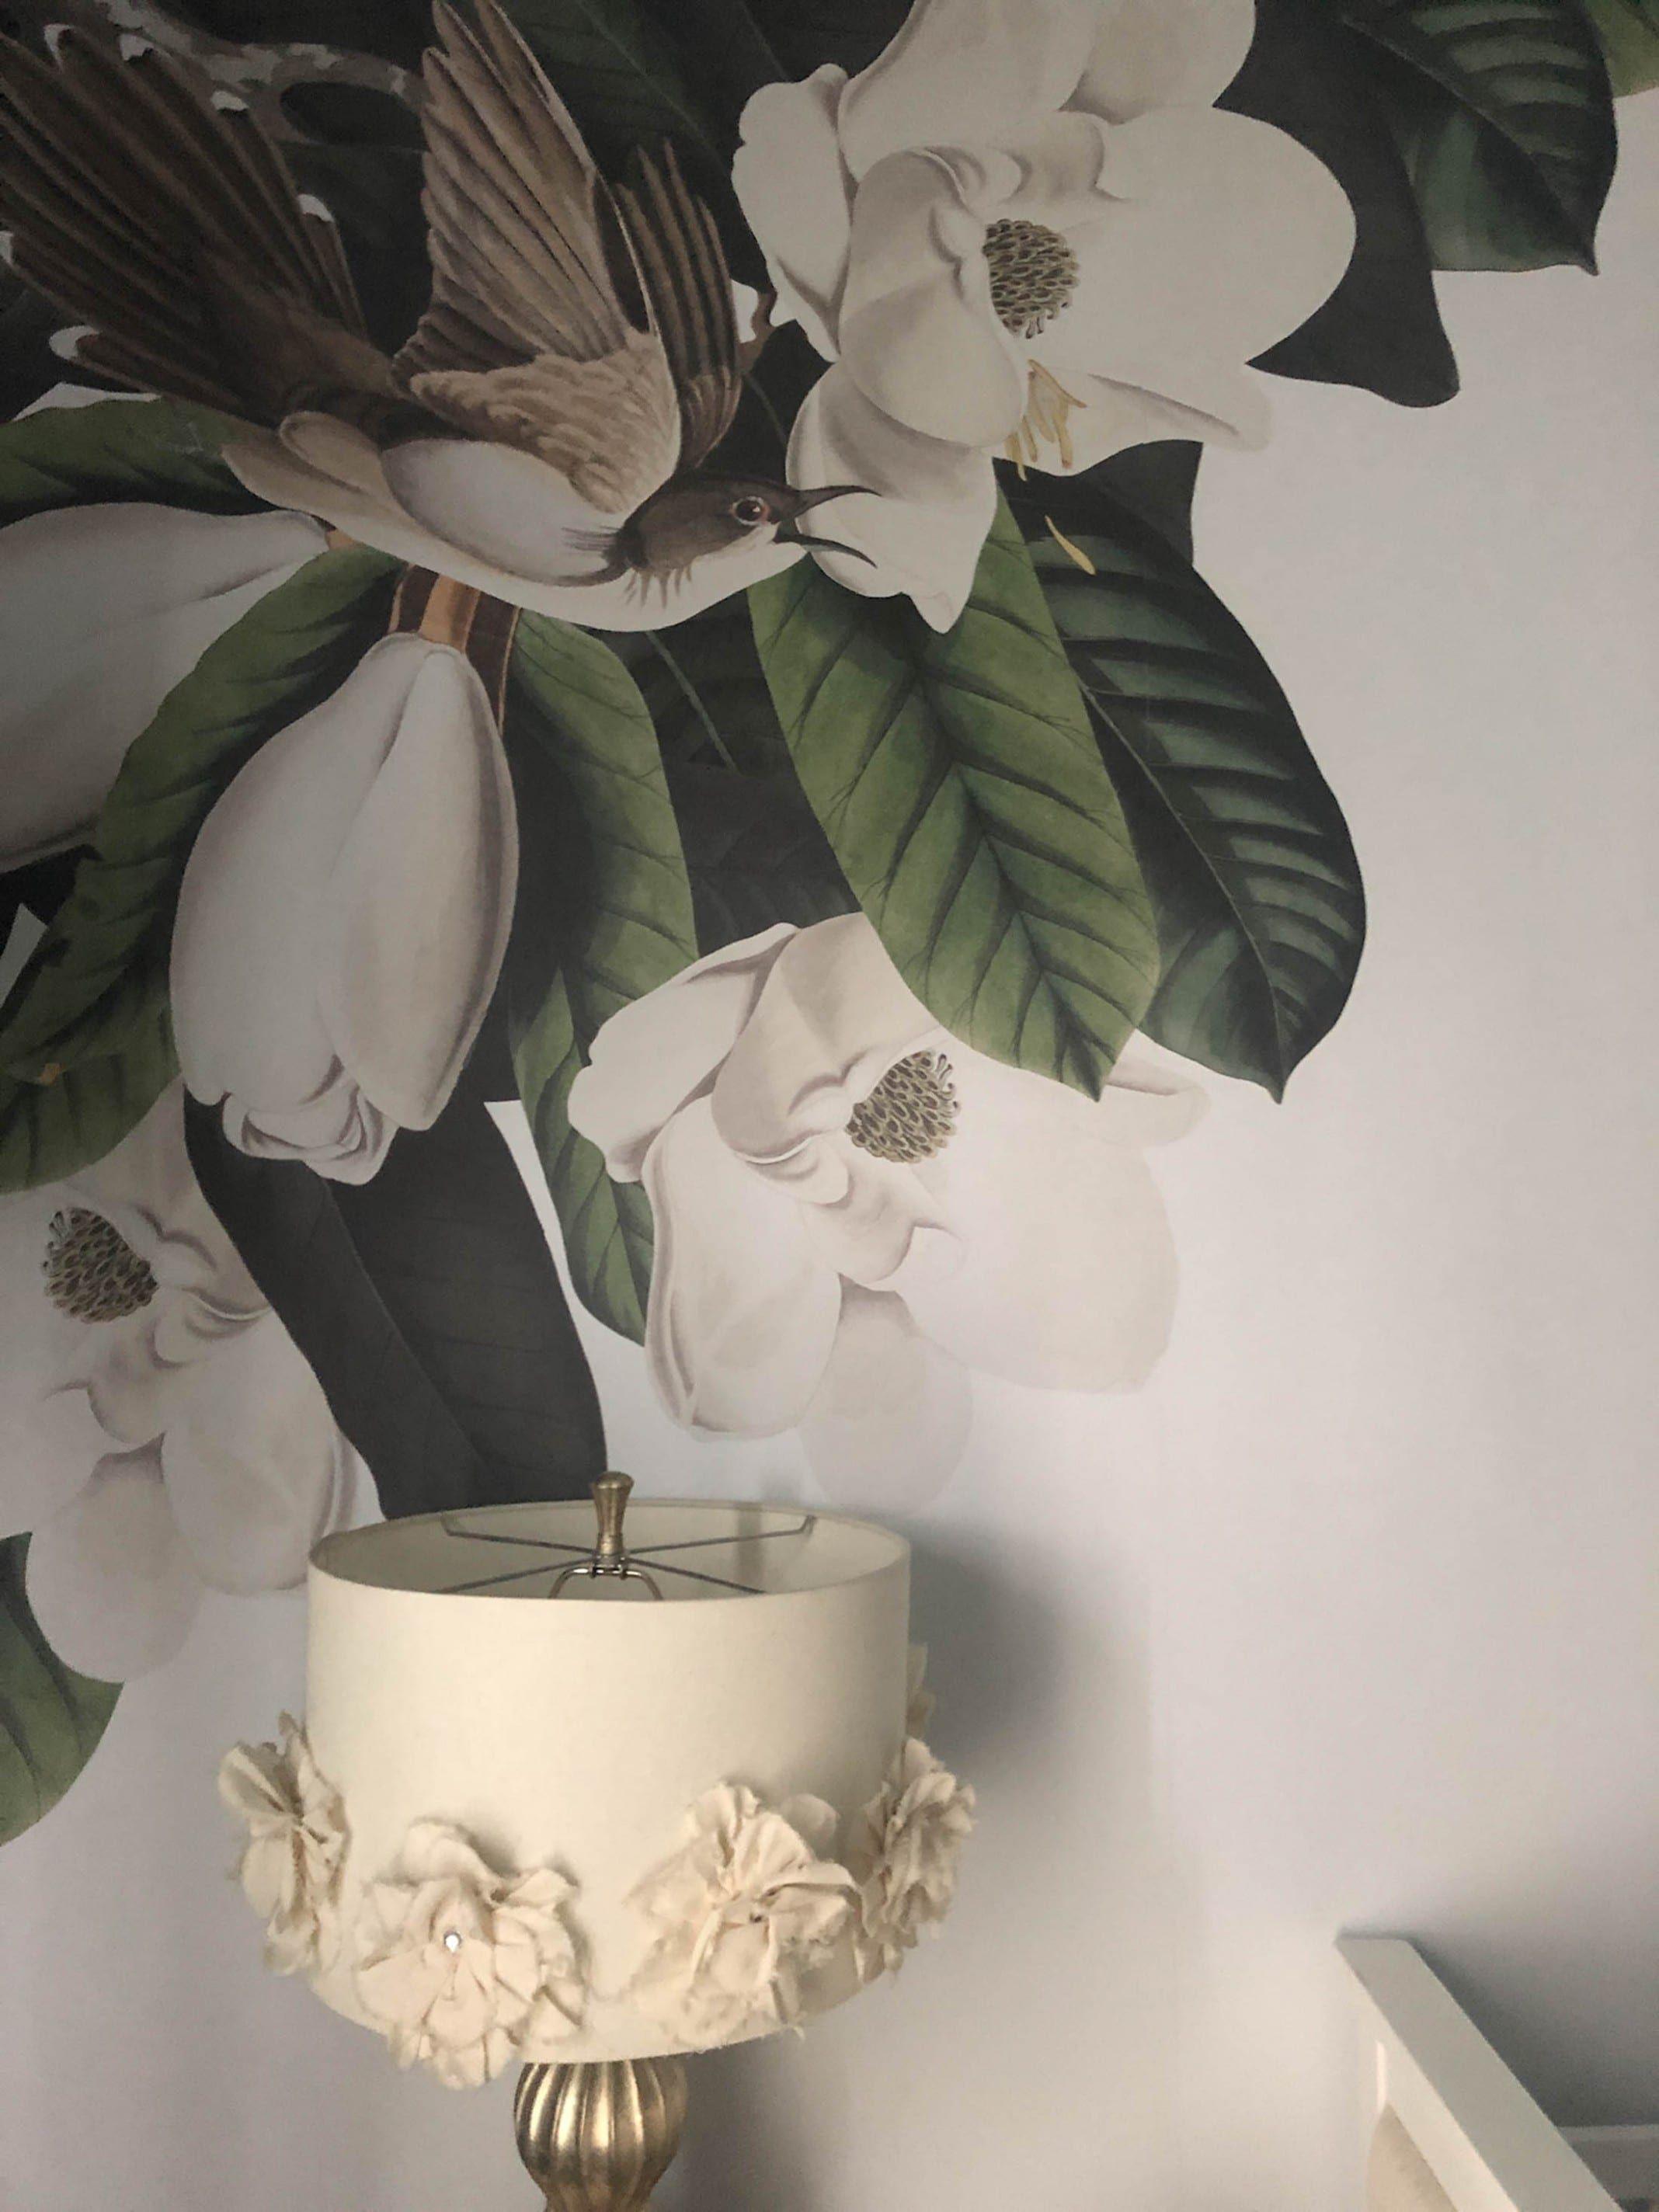 Let's Talk Removable Wallpaper The Peel & Stick Florals I